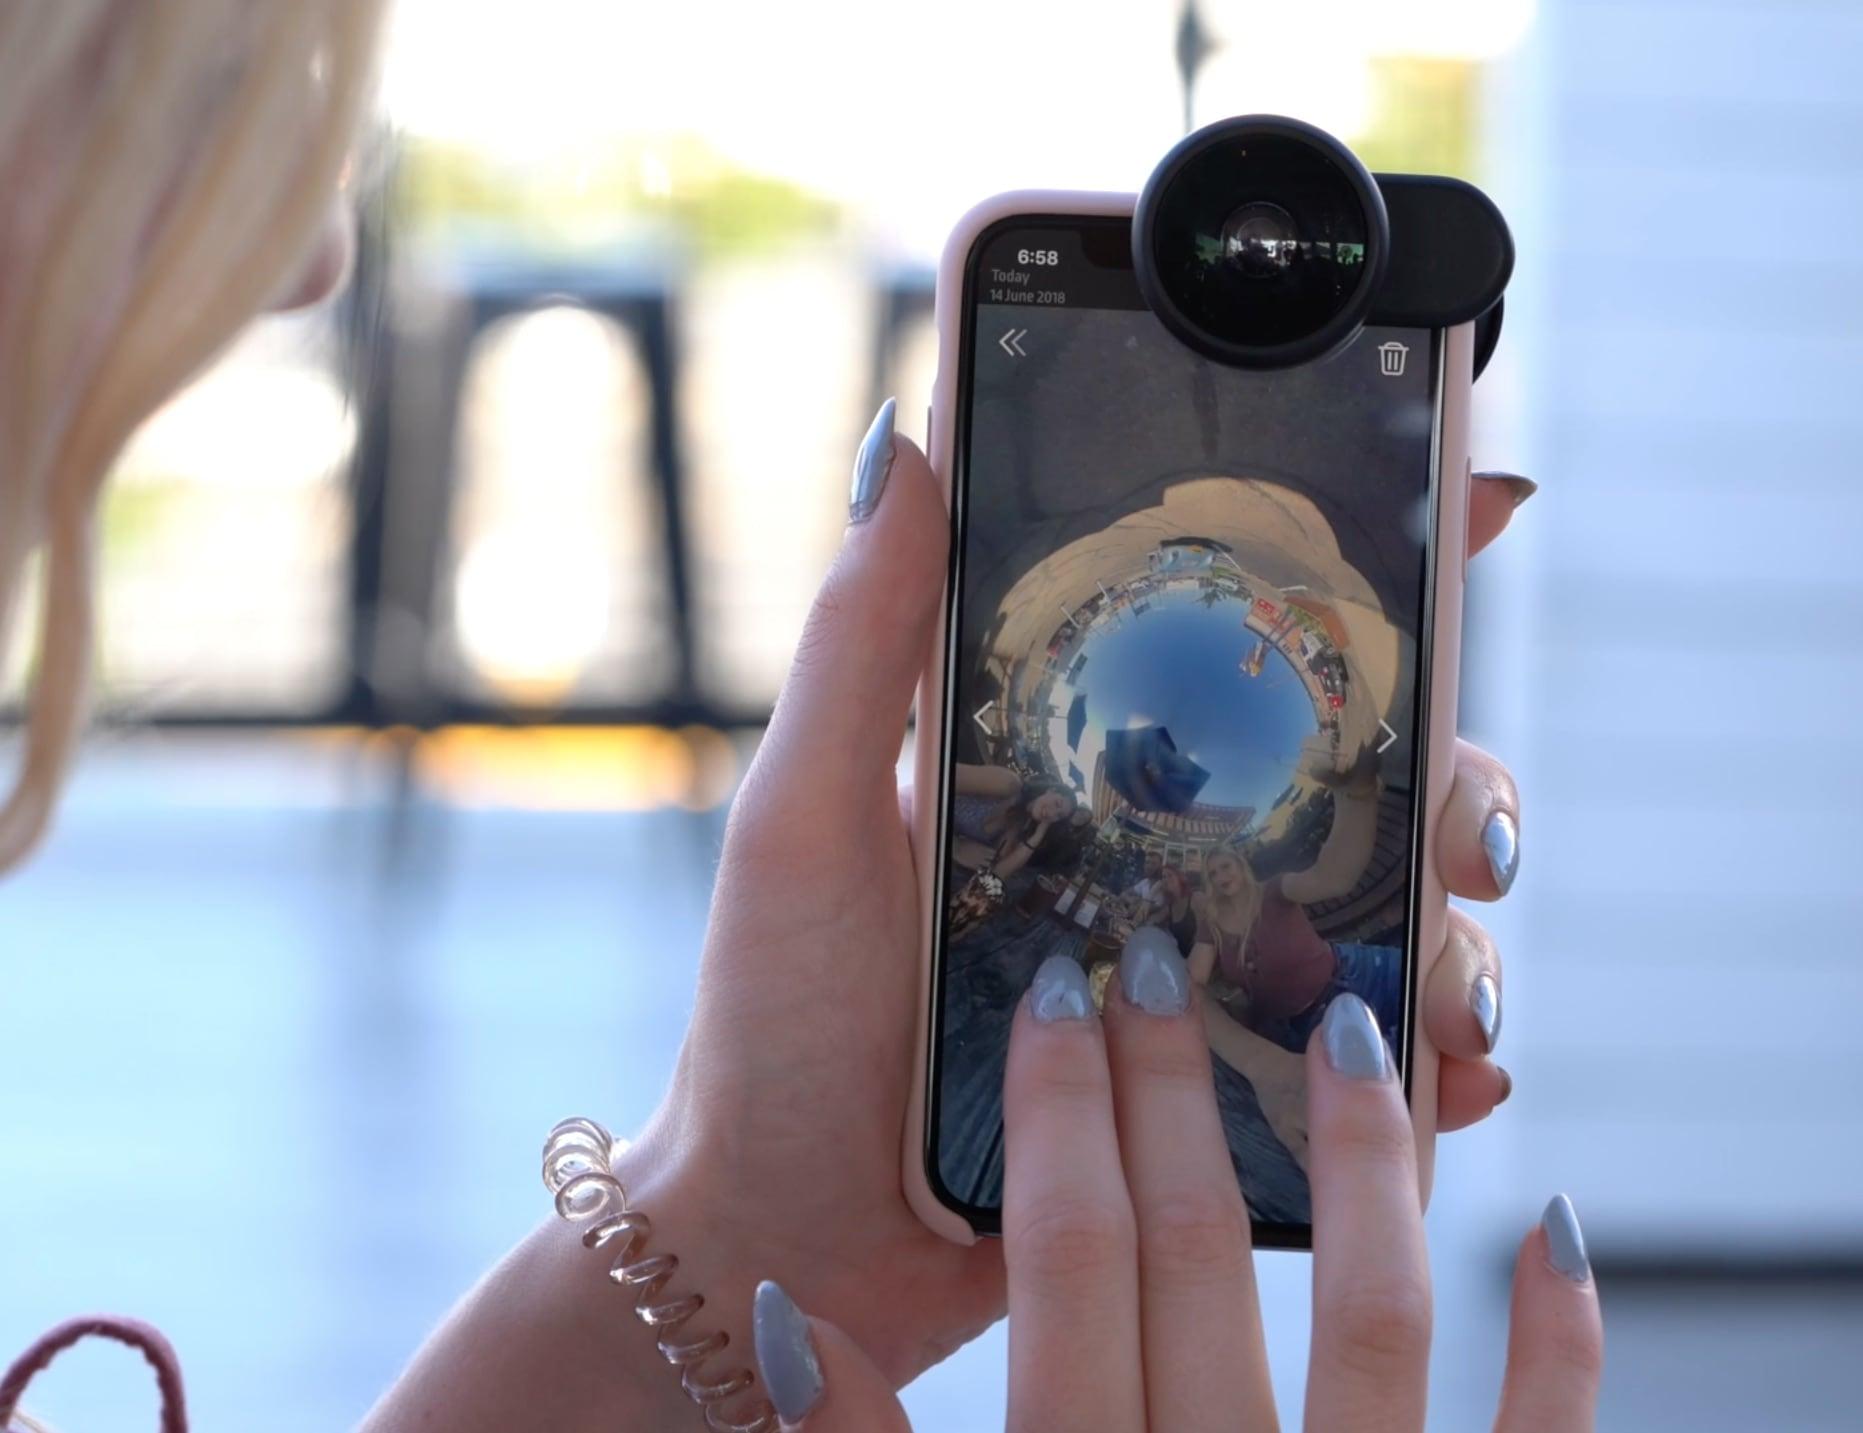 FusionLens 2.0 Cinematic iPhone Lens